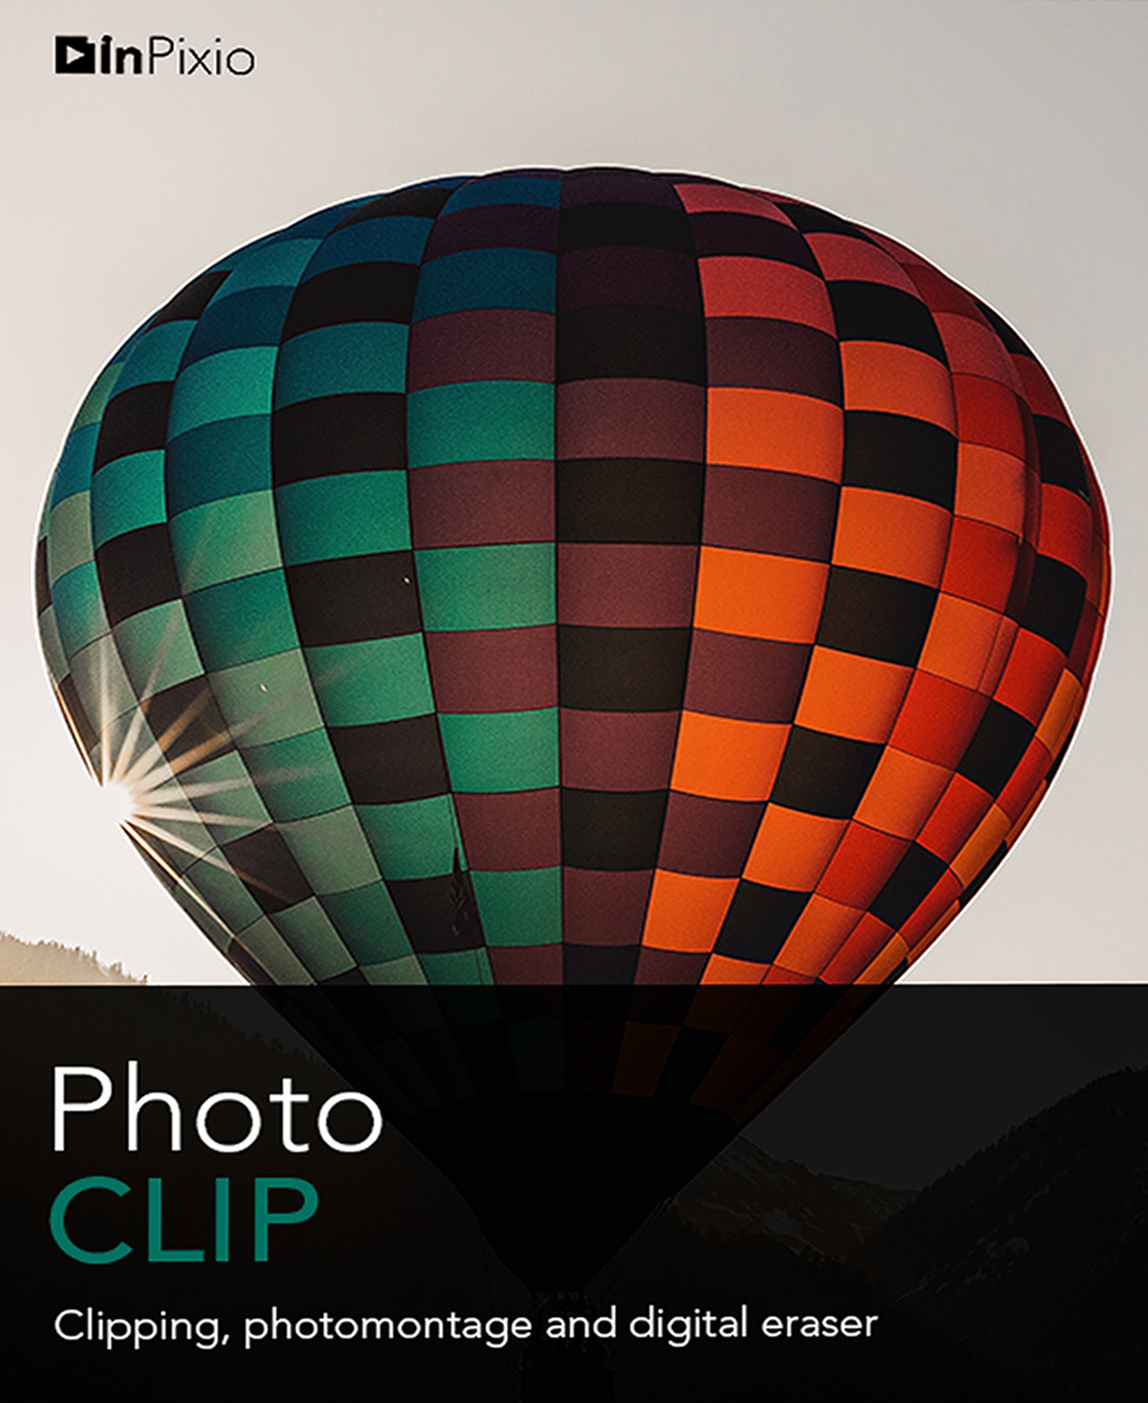 InPixio Photo Clip 8 [Download] by Avanquest